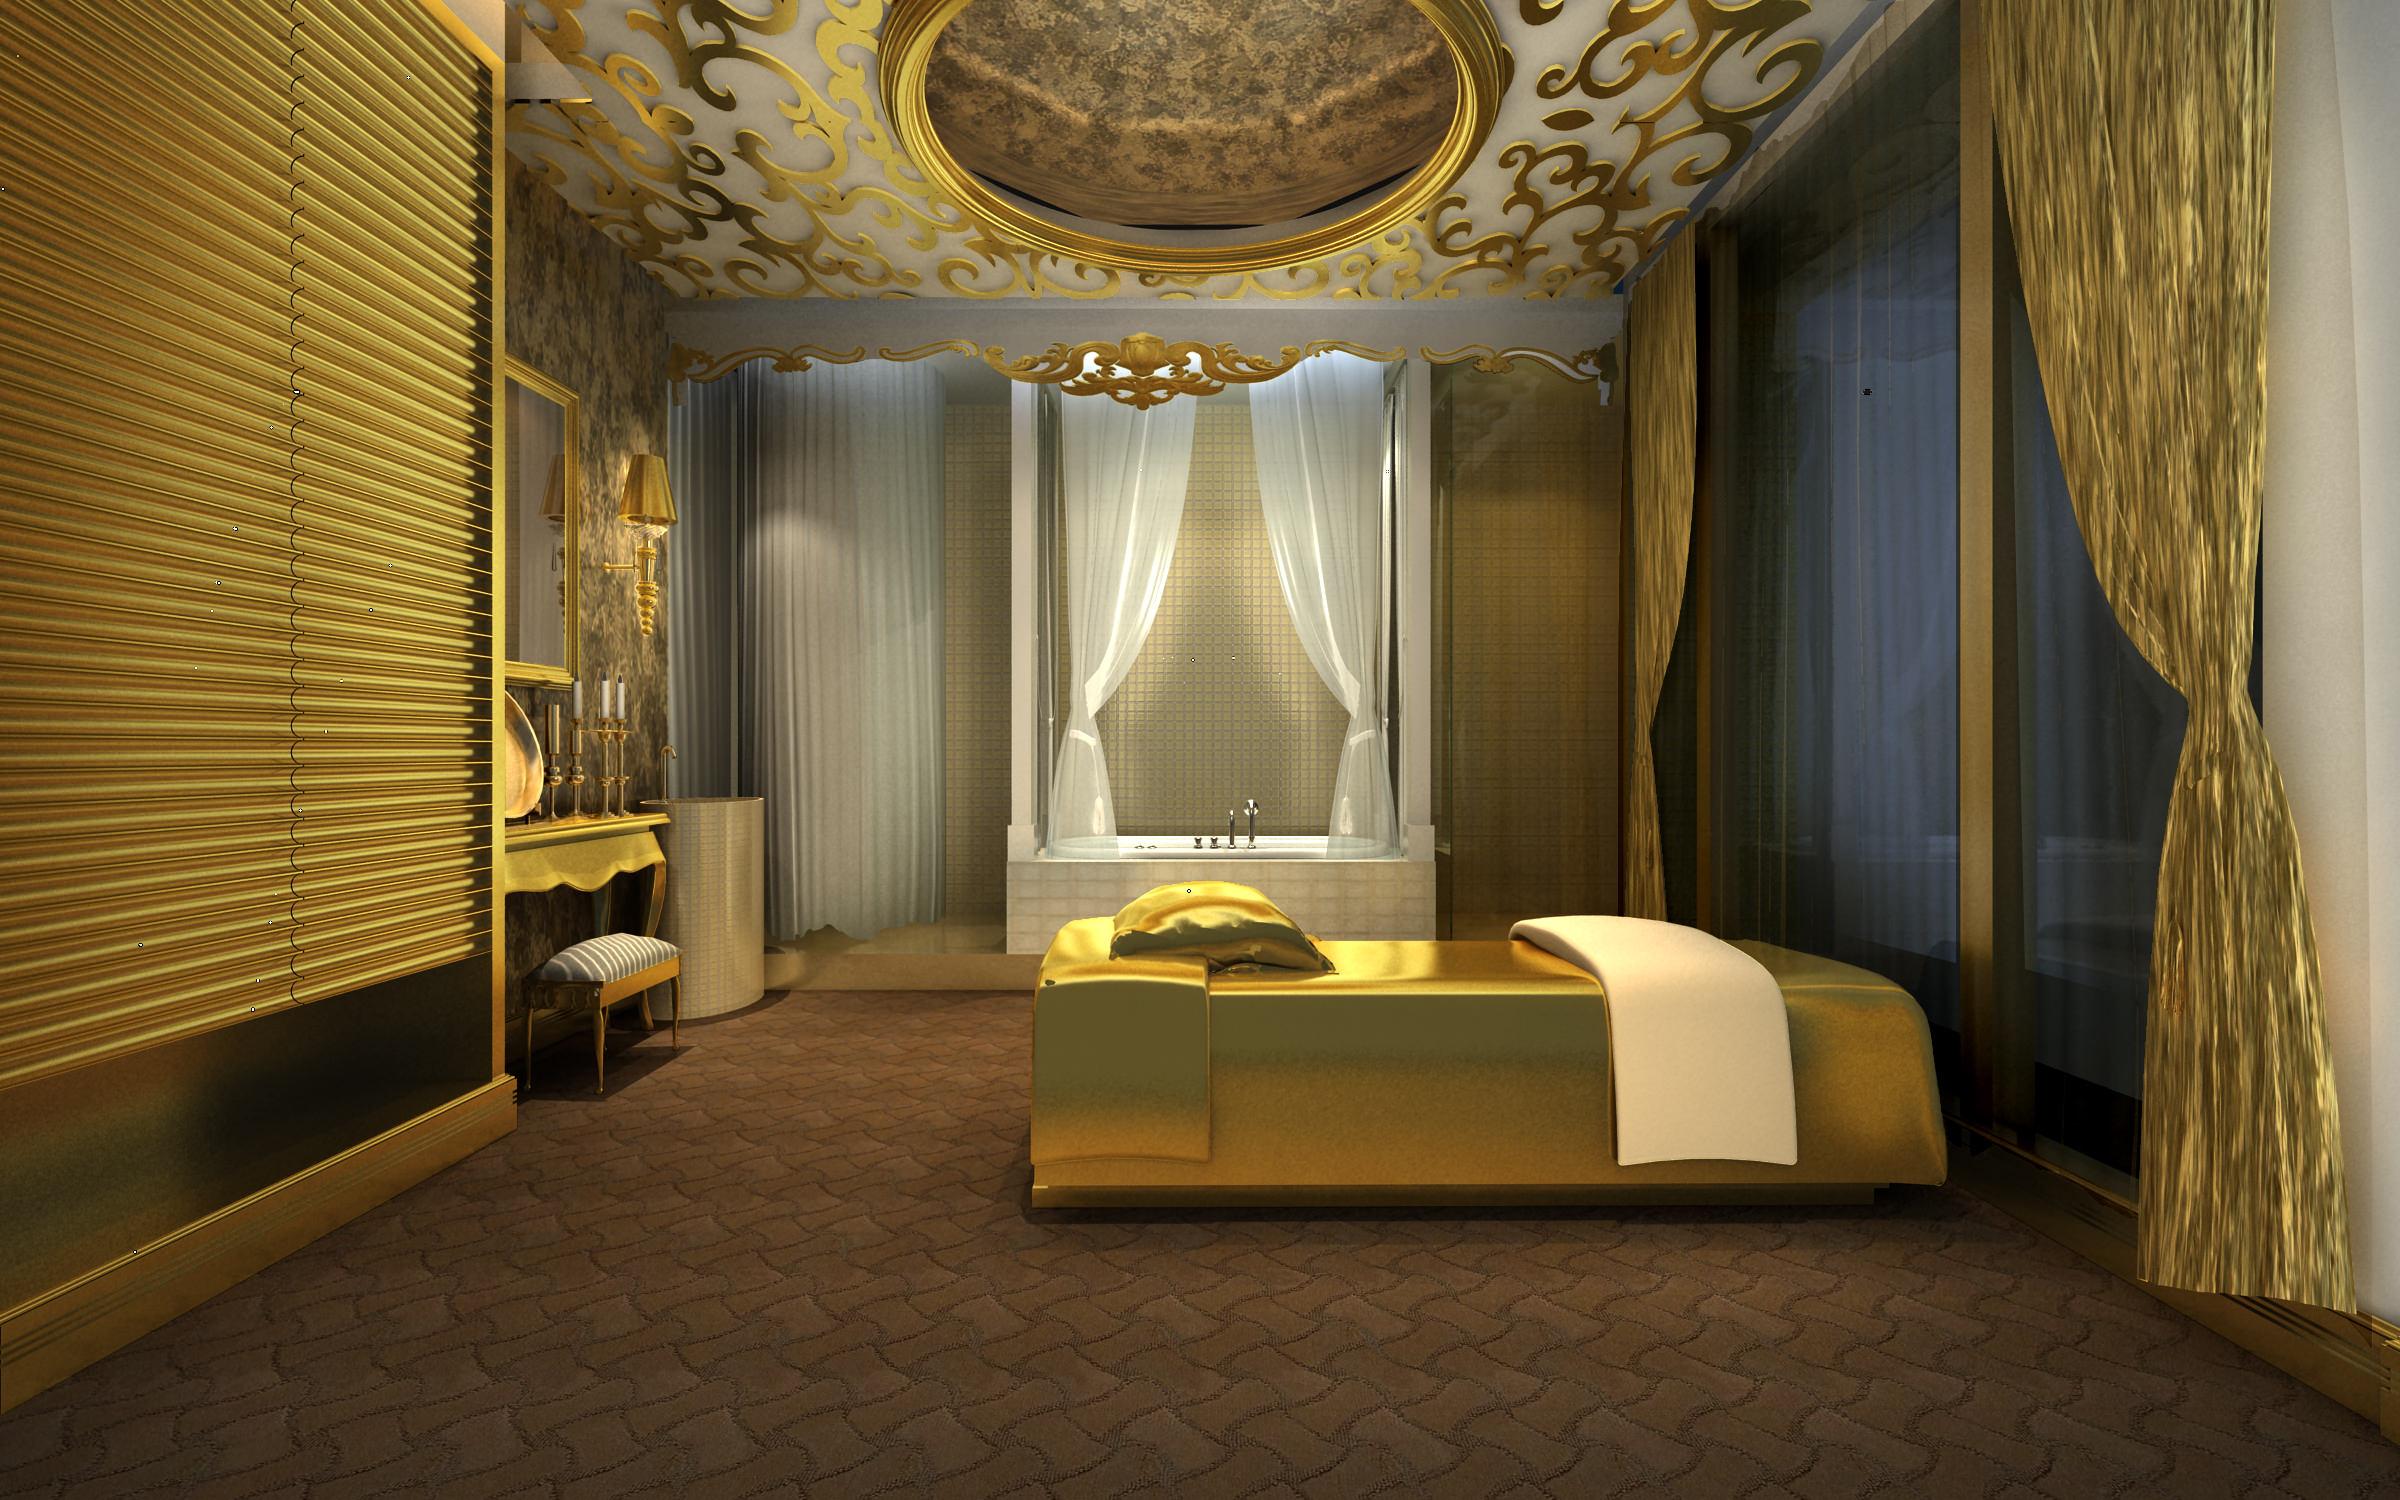 Spa Room Royal Designer Ceiling 3d Model Max Cgtrader Com